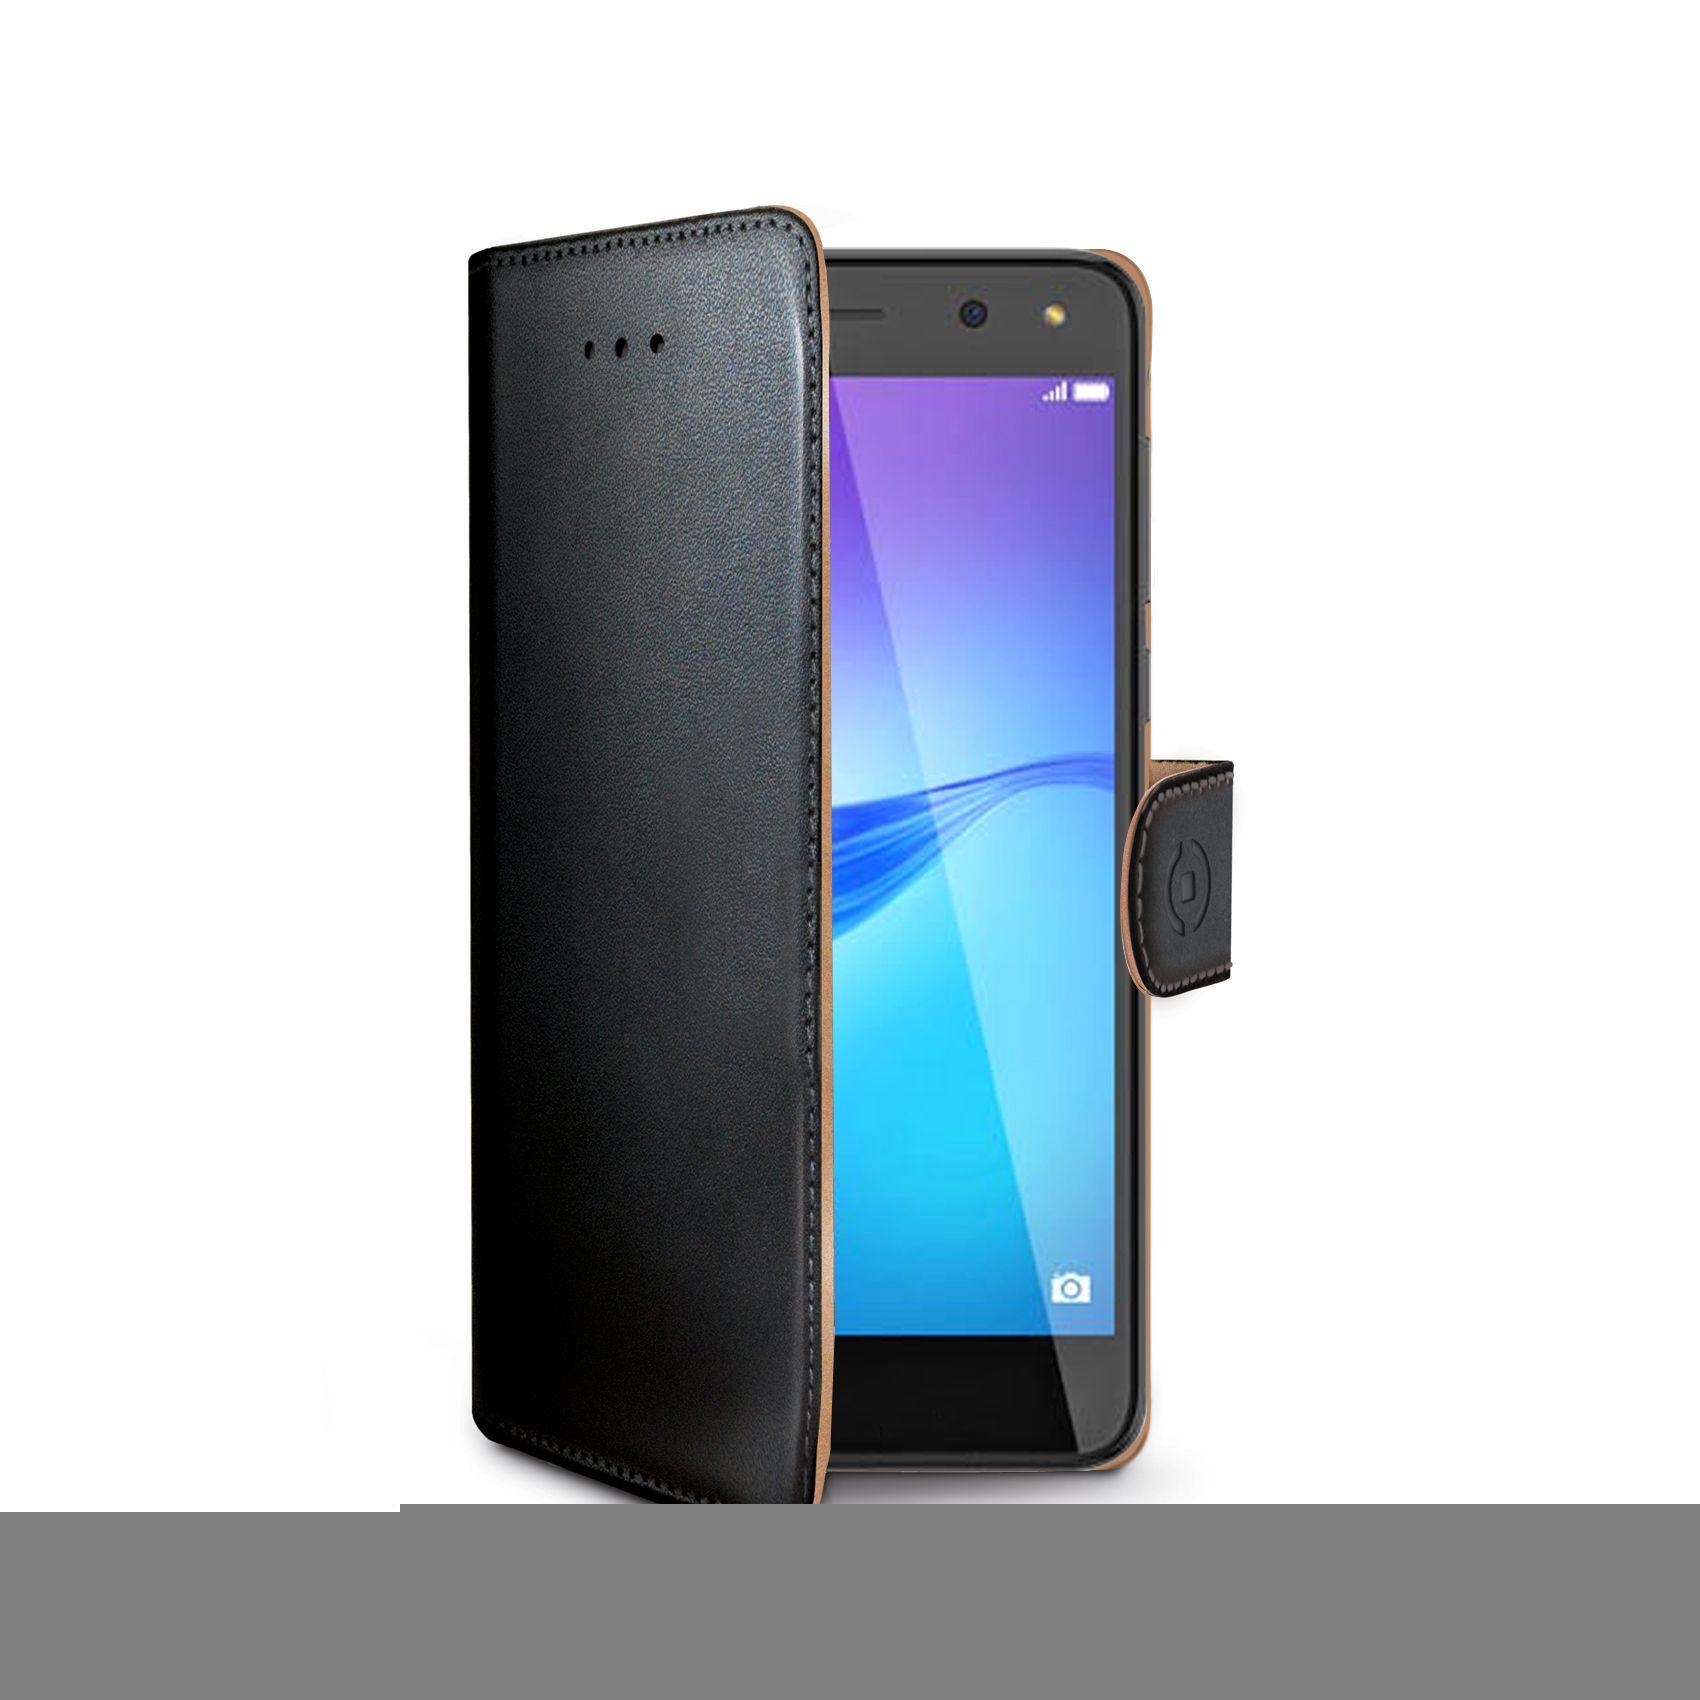 Pouzdro typu kniha CELLY Wally pro Huawei Y6 (2017), PU kůže, černé